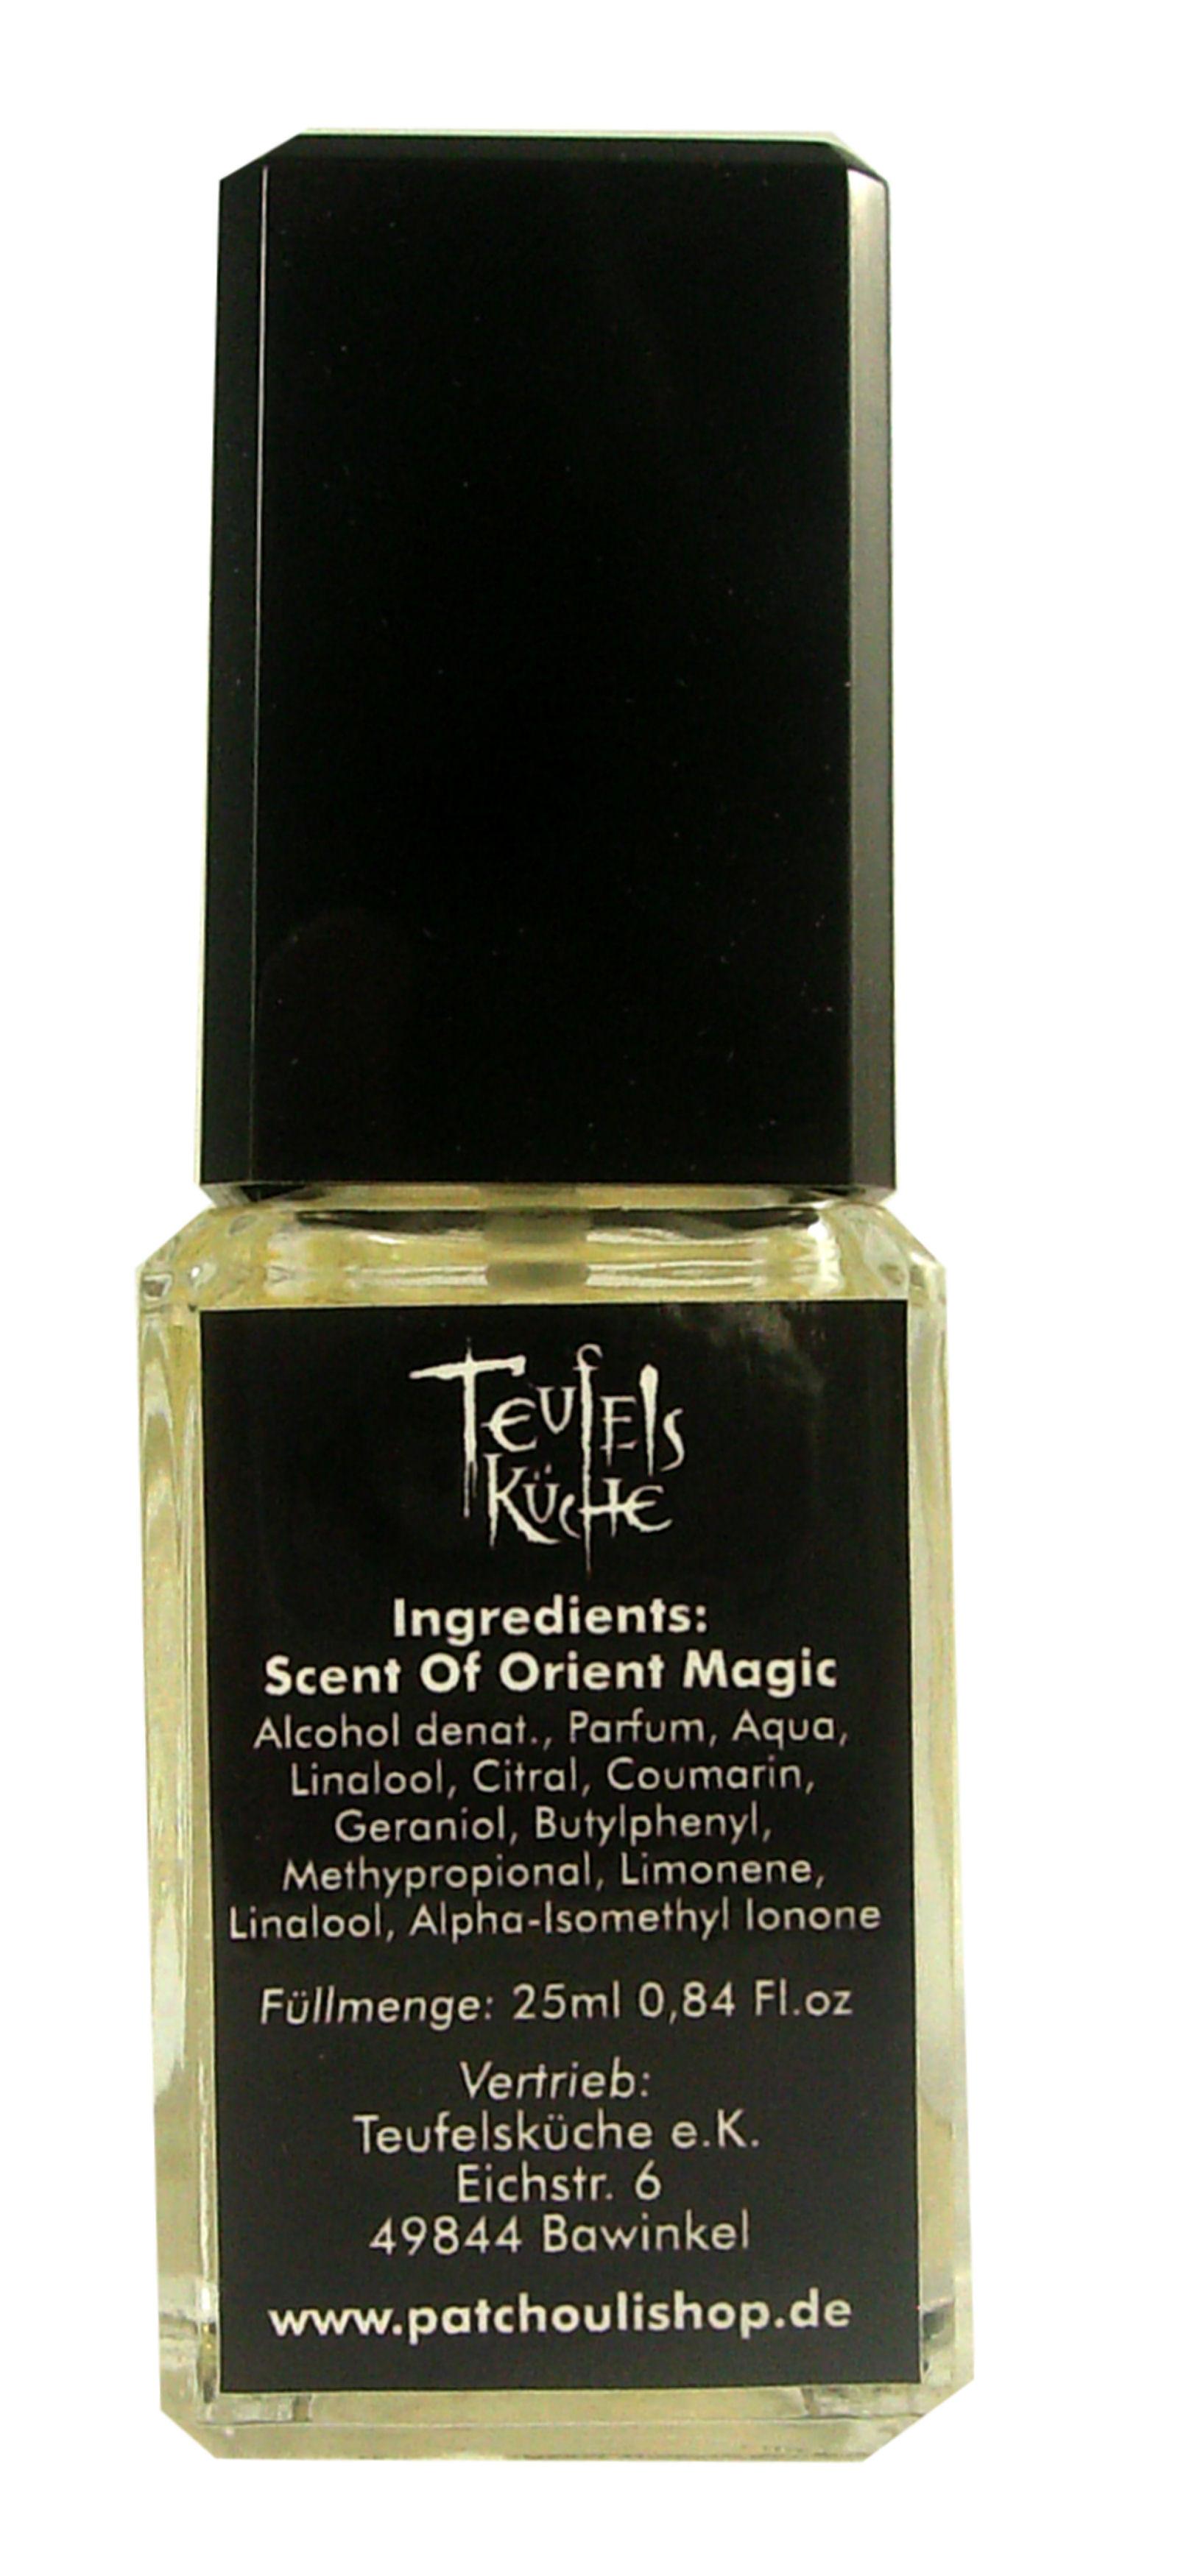 Scent Of Orient Magic, Patchouli orientalisch 25ml